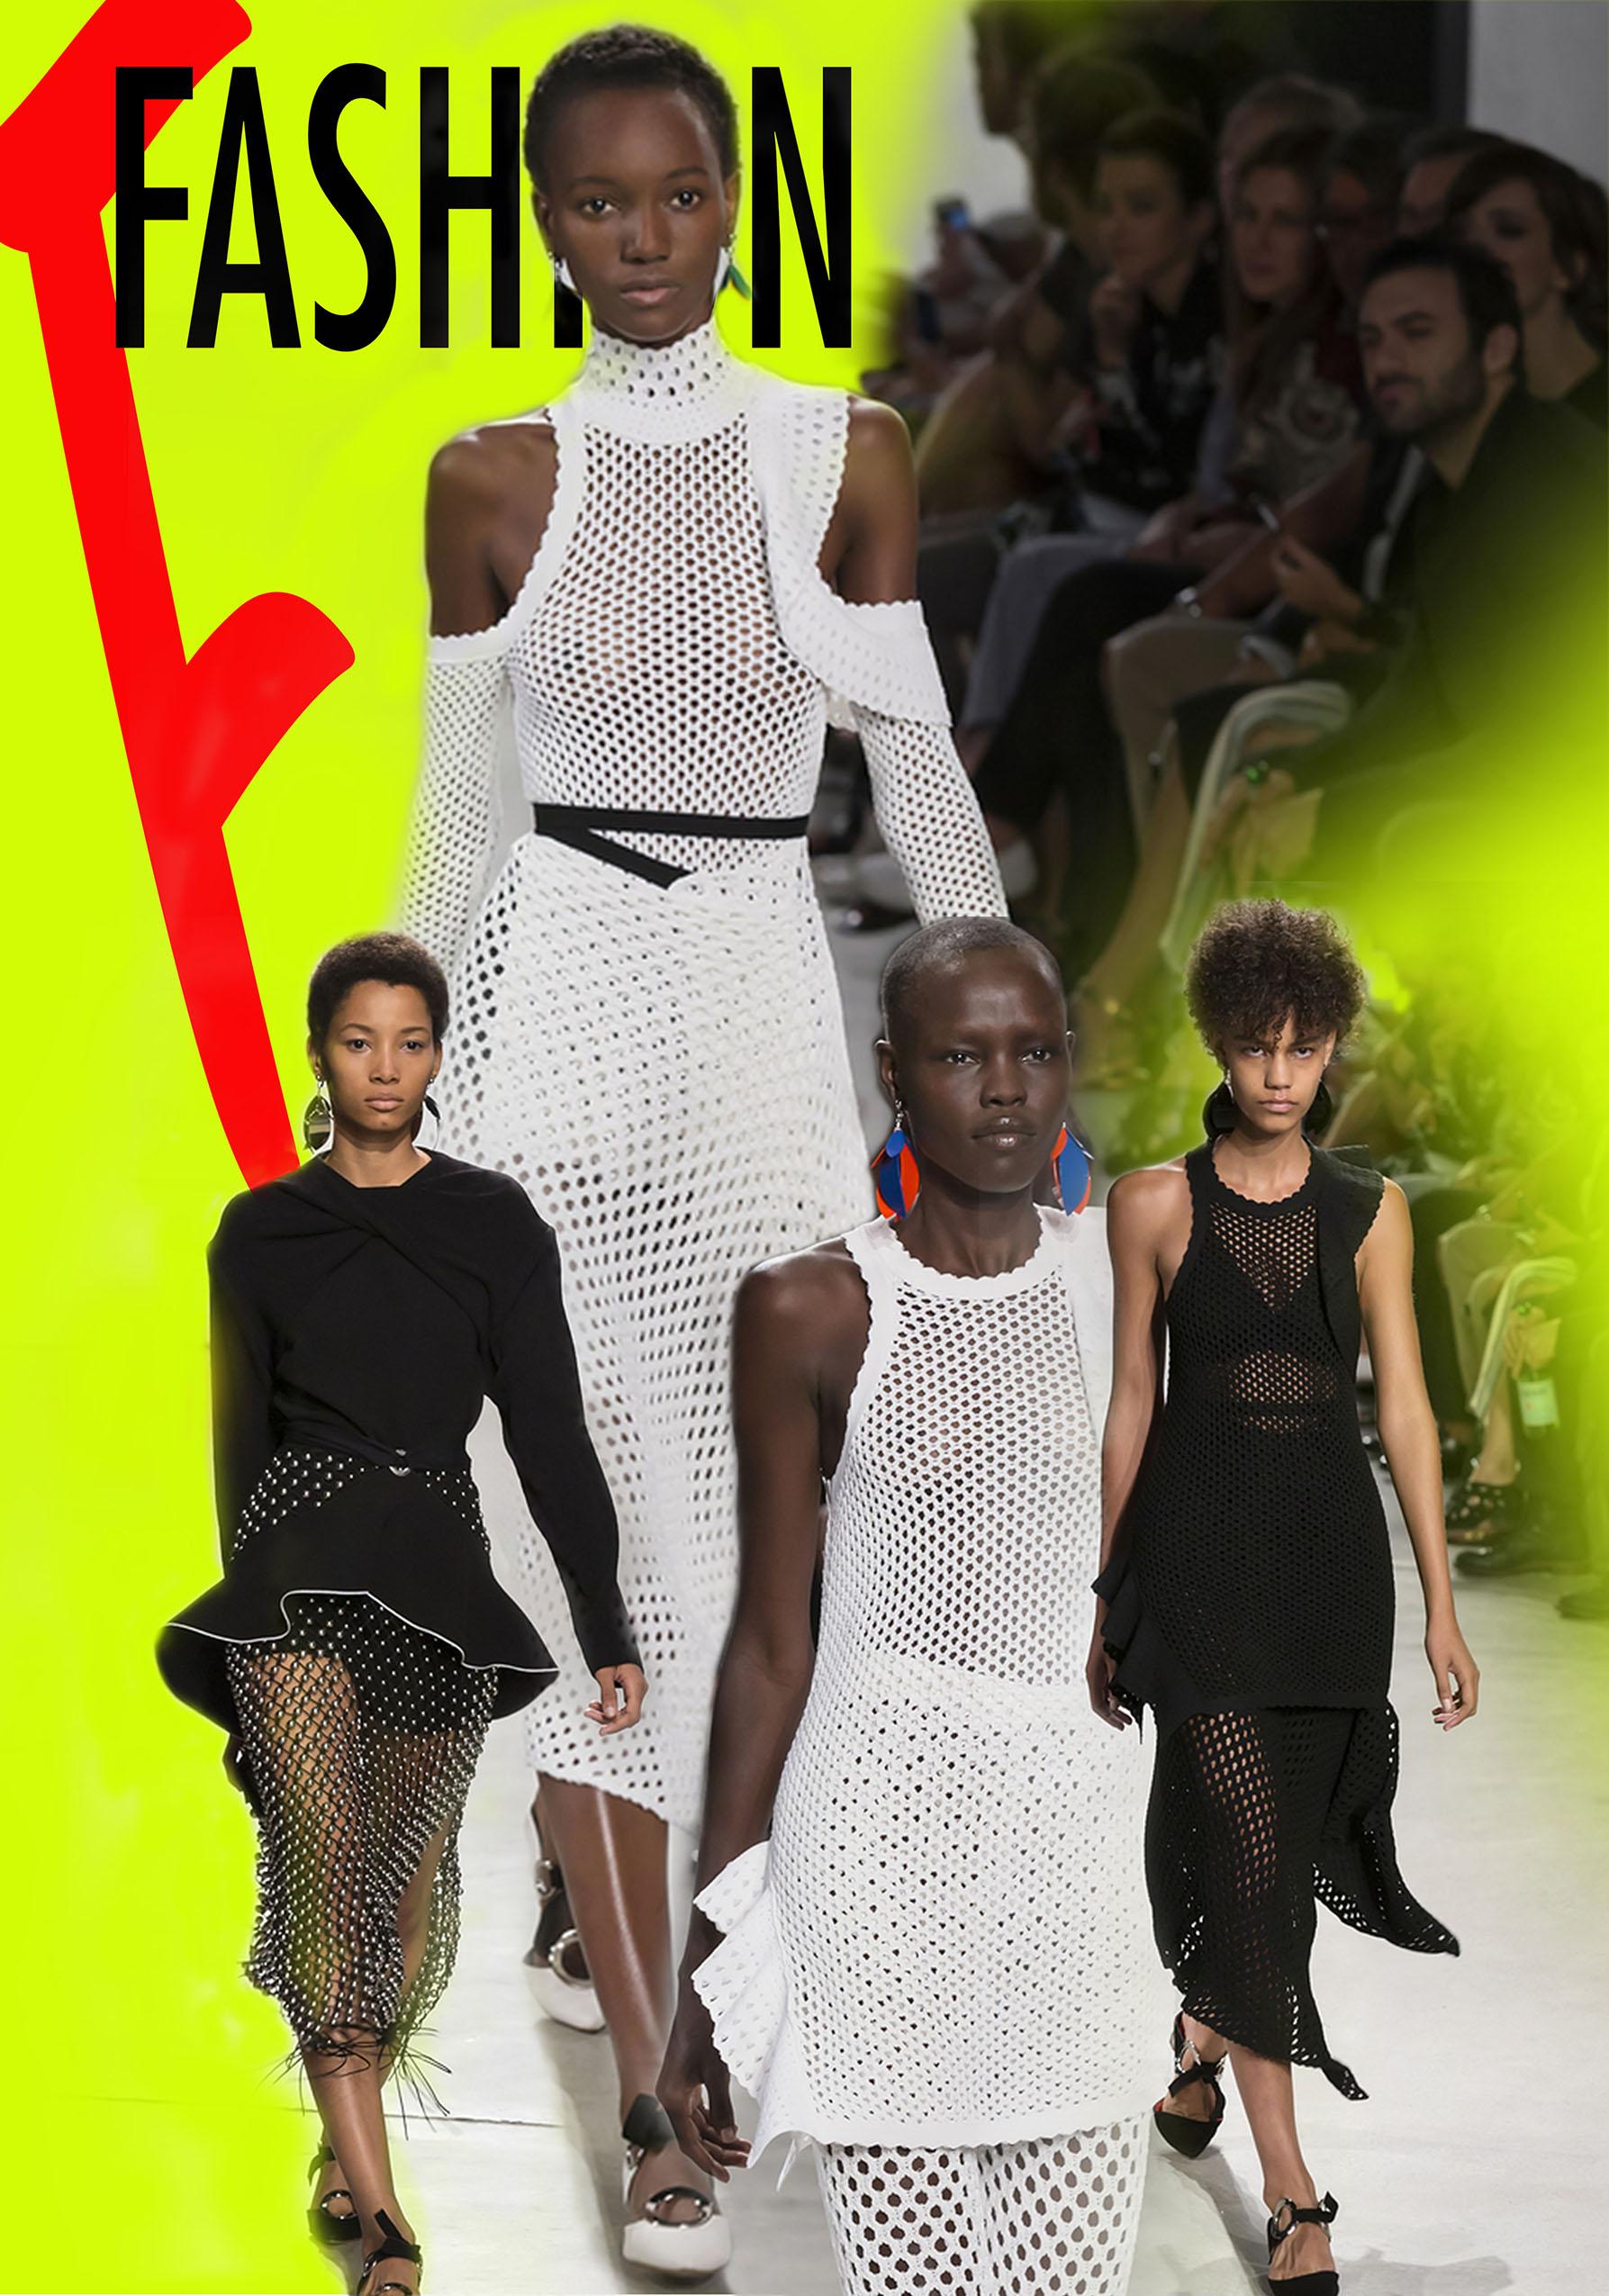 Fashion-collage